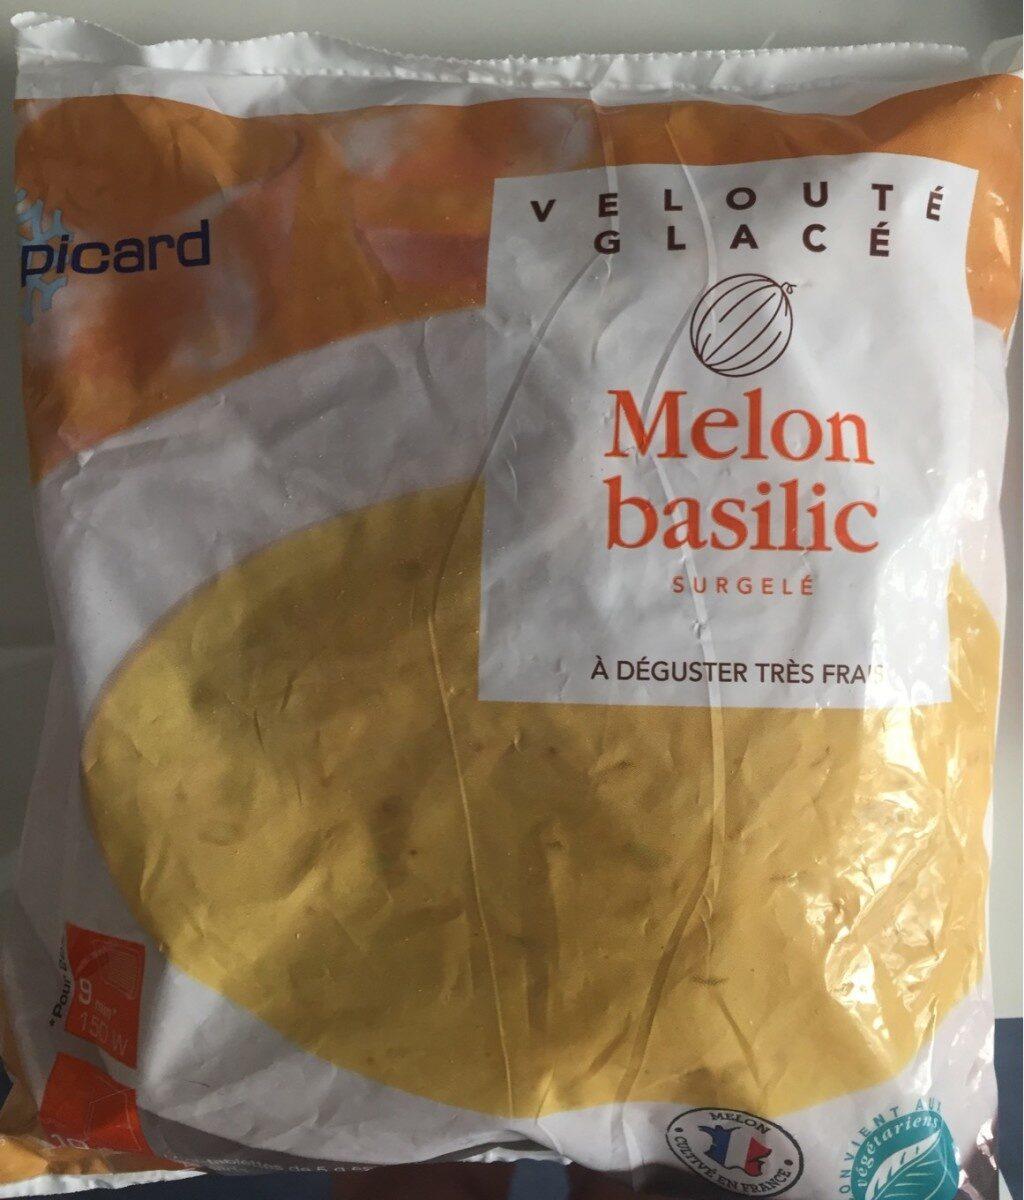 Velouté glacé melon basilic - Product - fr